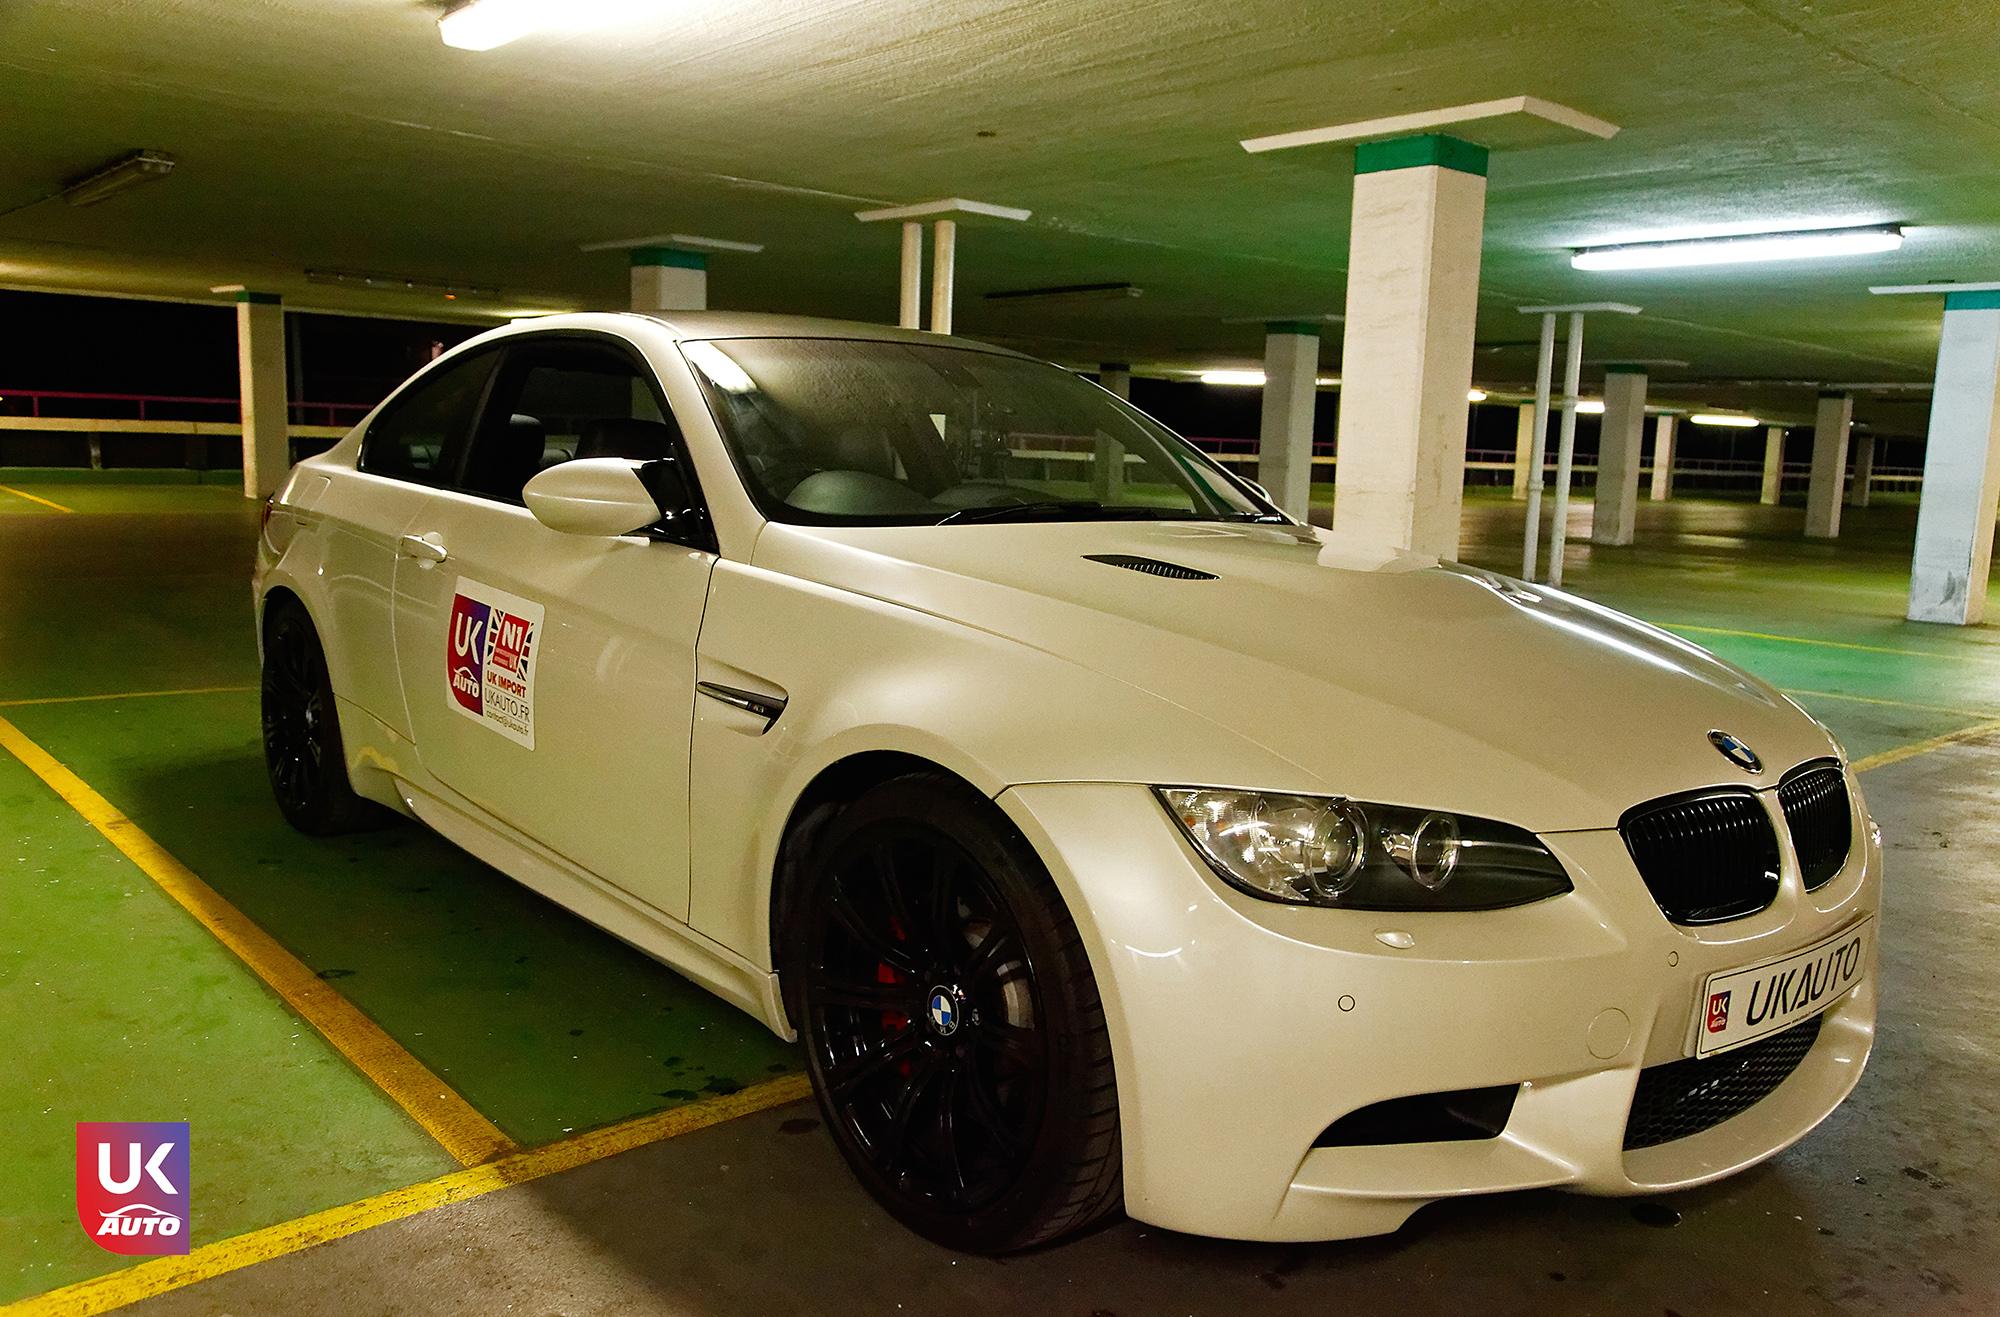 BMW m3 E92 import auto mandataire angleterre uk londres bmw leboncoin achat angleterre bmw voiture anglaise auto rhd e92 uk auto1 - Felecitation a Clement pour cette BMW M3 E92 COUPE RHD PACK CARBON BMW ANGLETERRE VOITURE UK